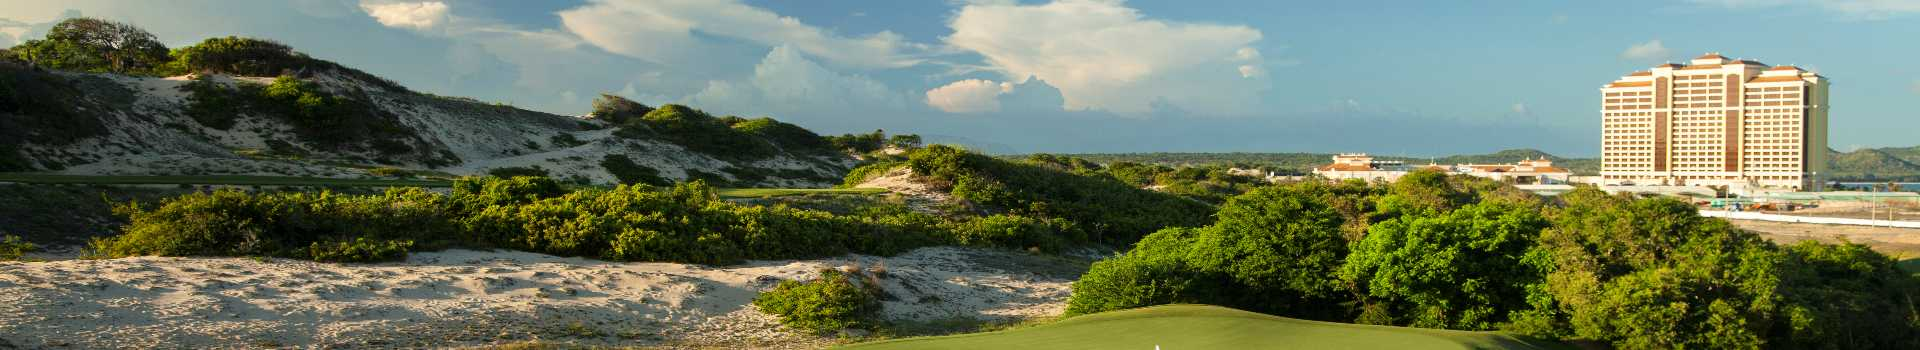 Vietnam Golf Trail